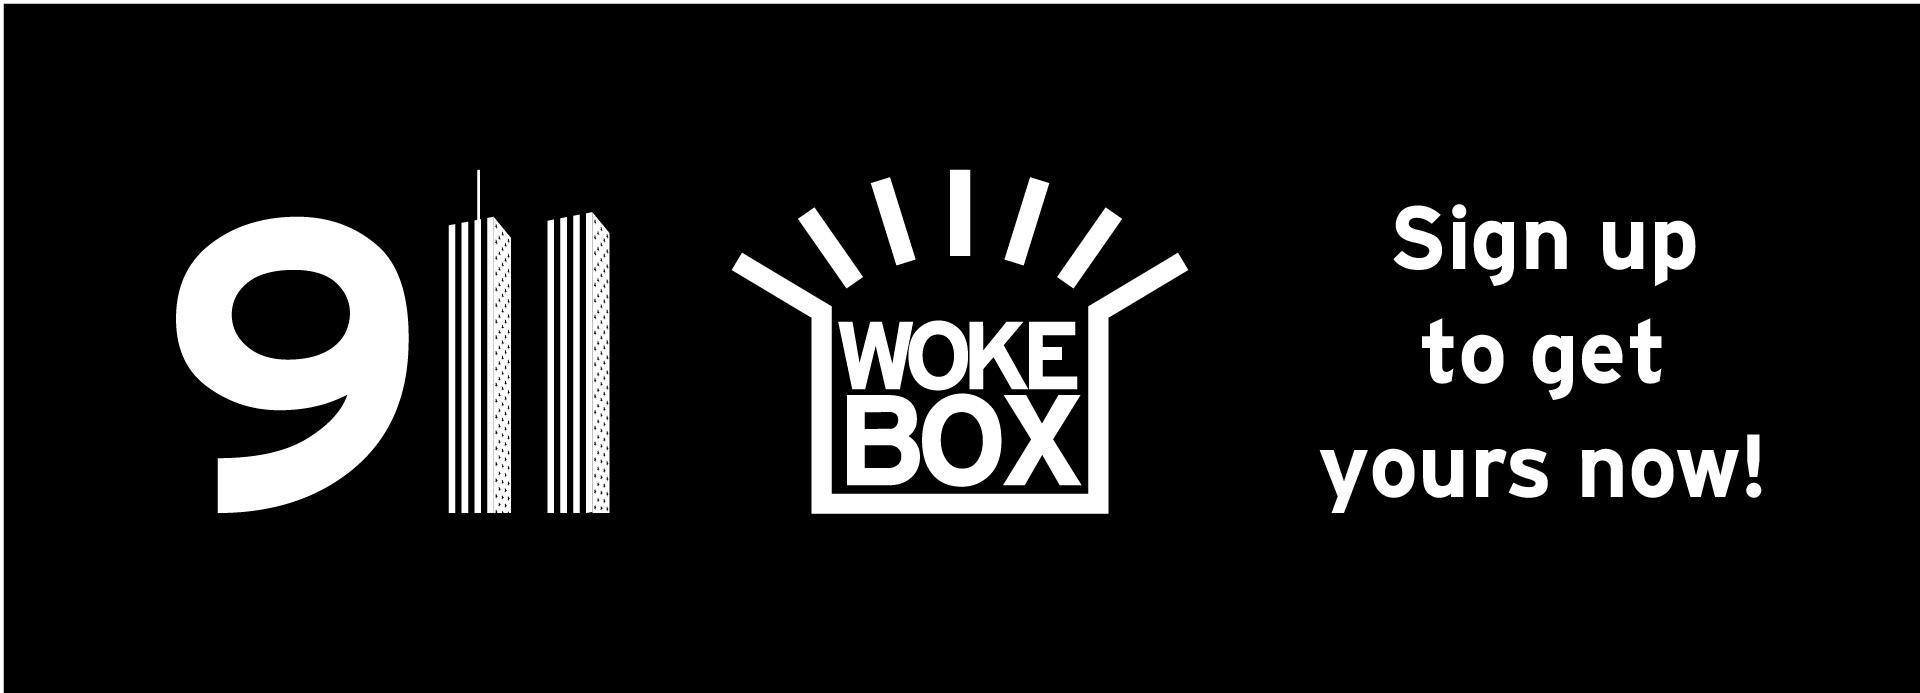 9-11 Woke Box